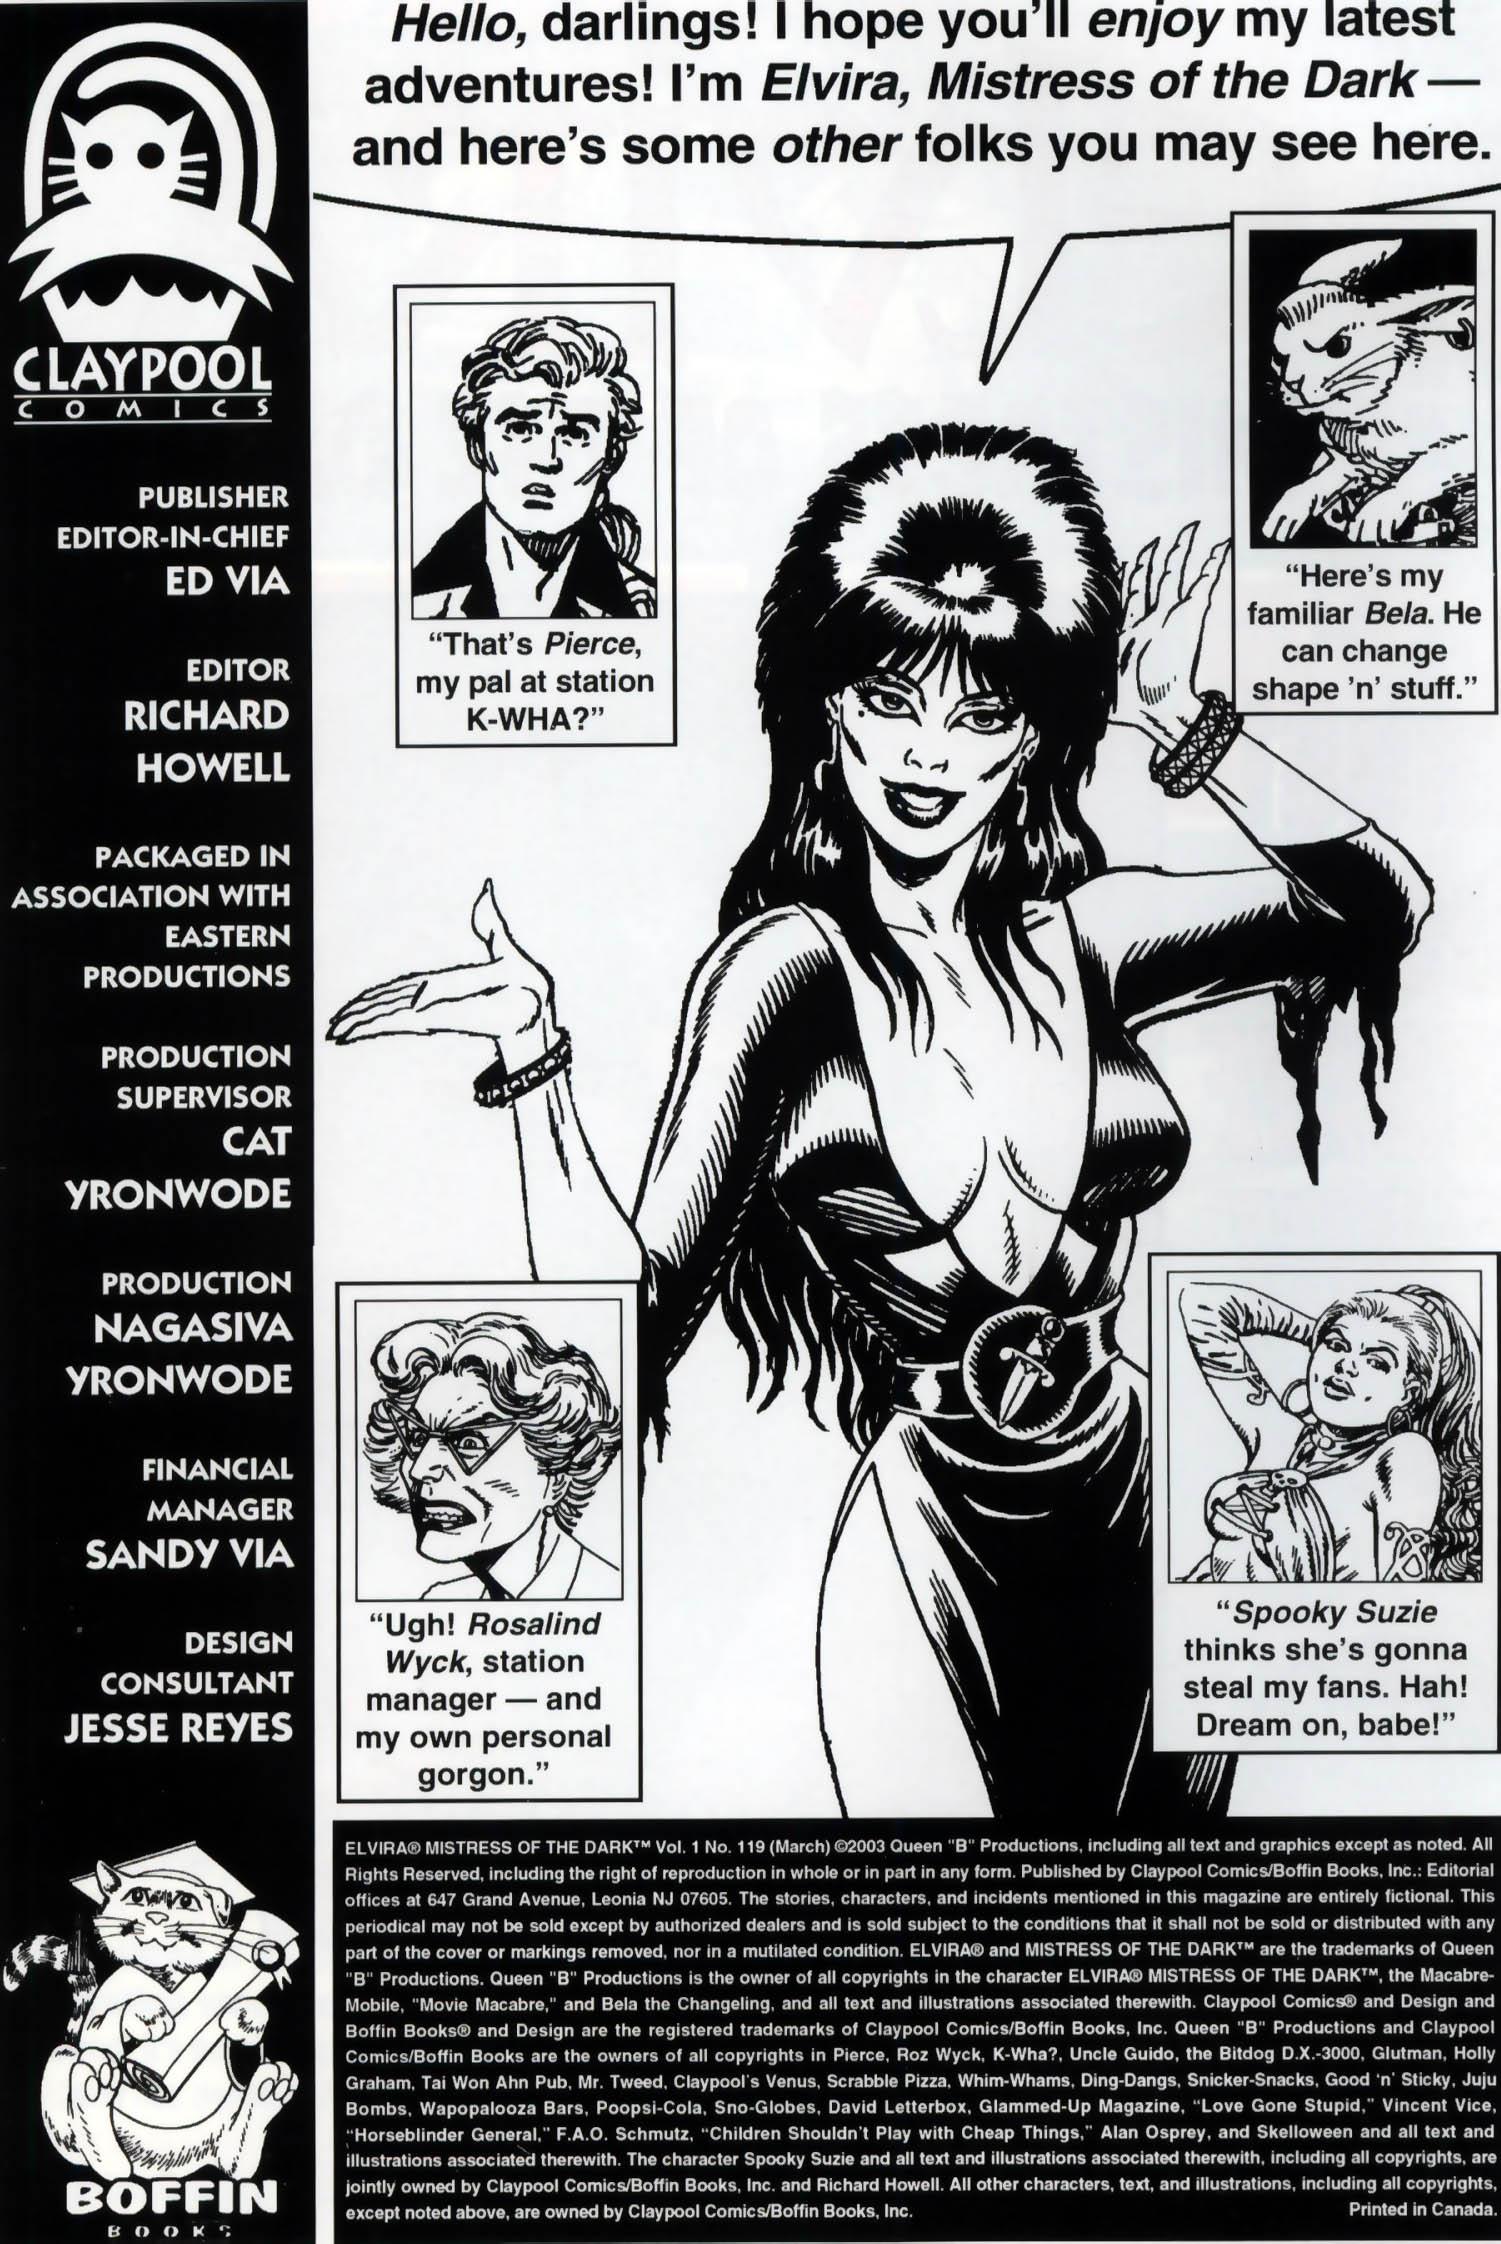 Read online Elvira, Mistress of the Dark comic -  Issue #119 - 2